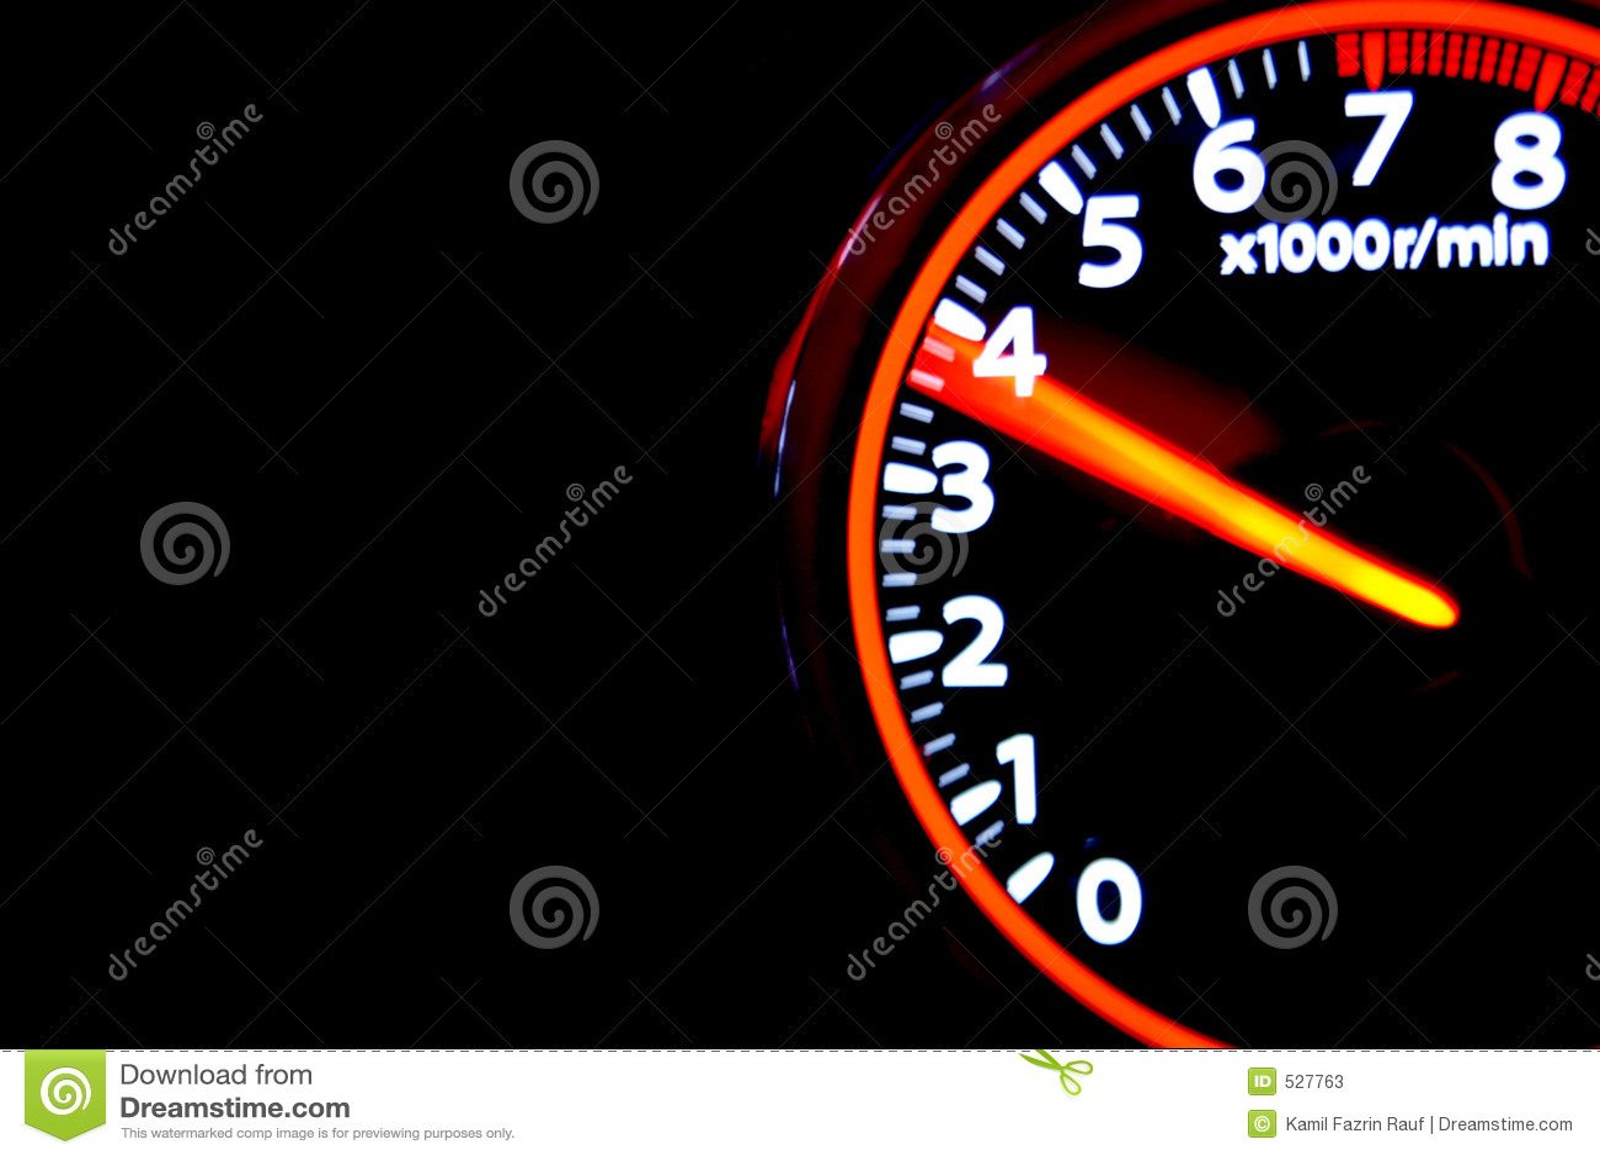 rpm meter stock image image of movement speed torque 527763